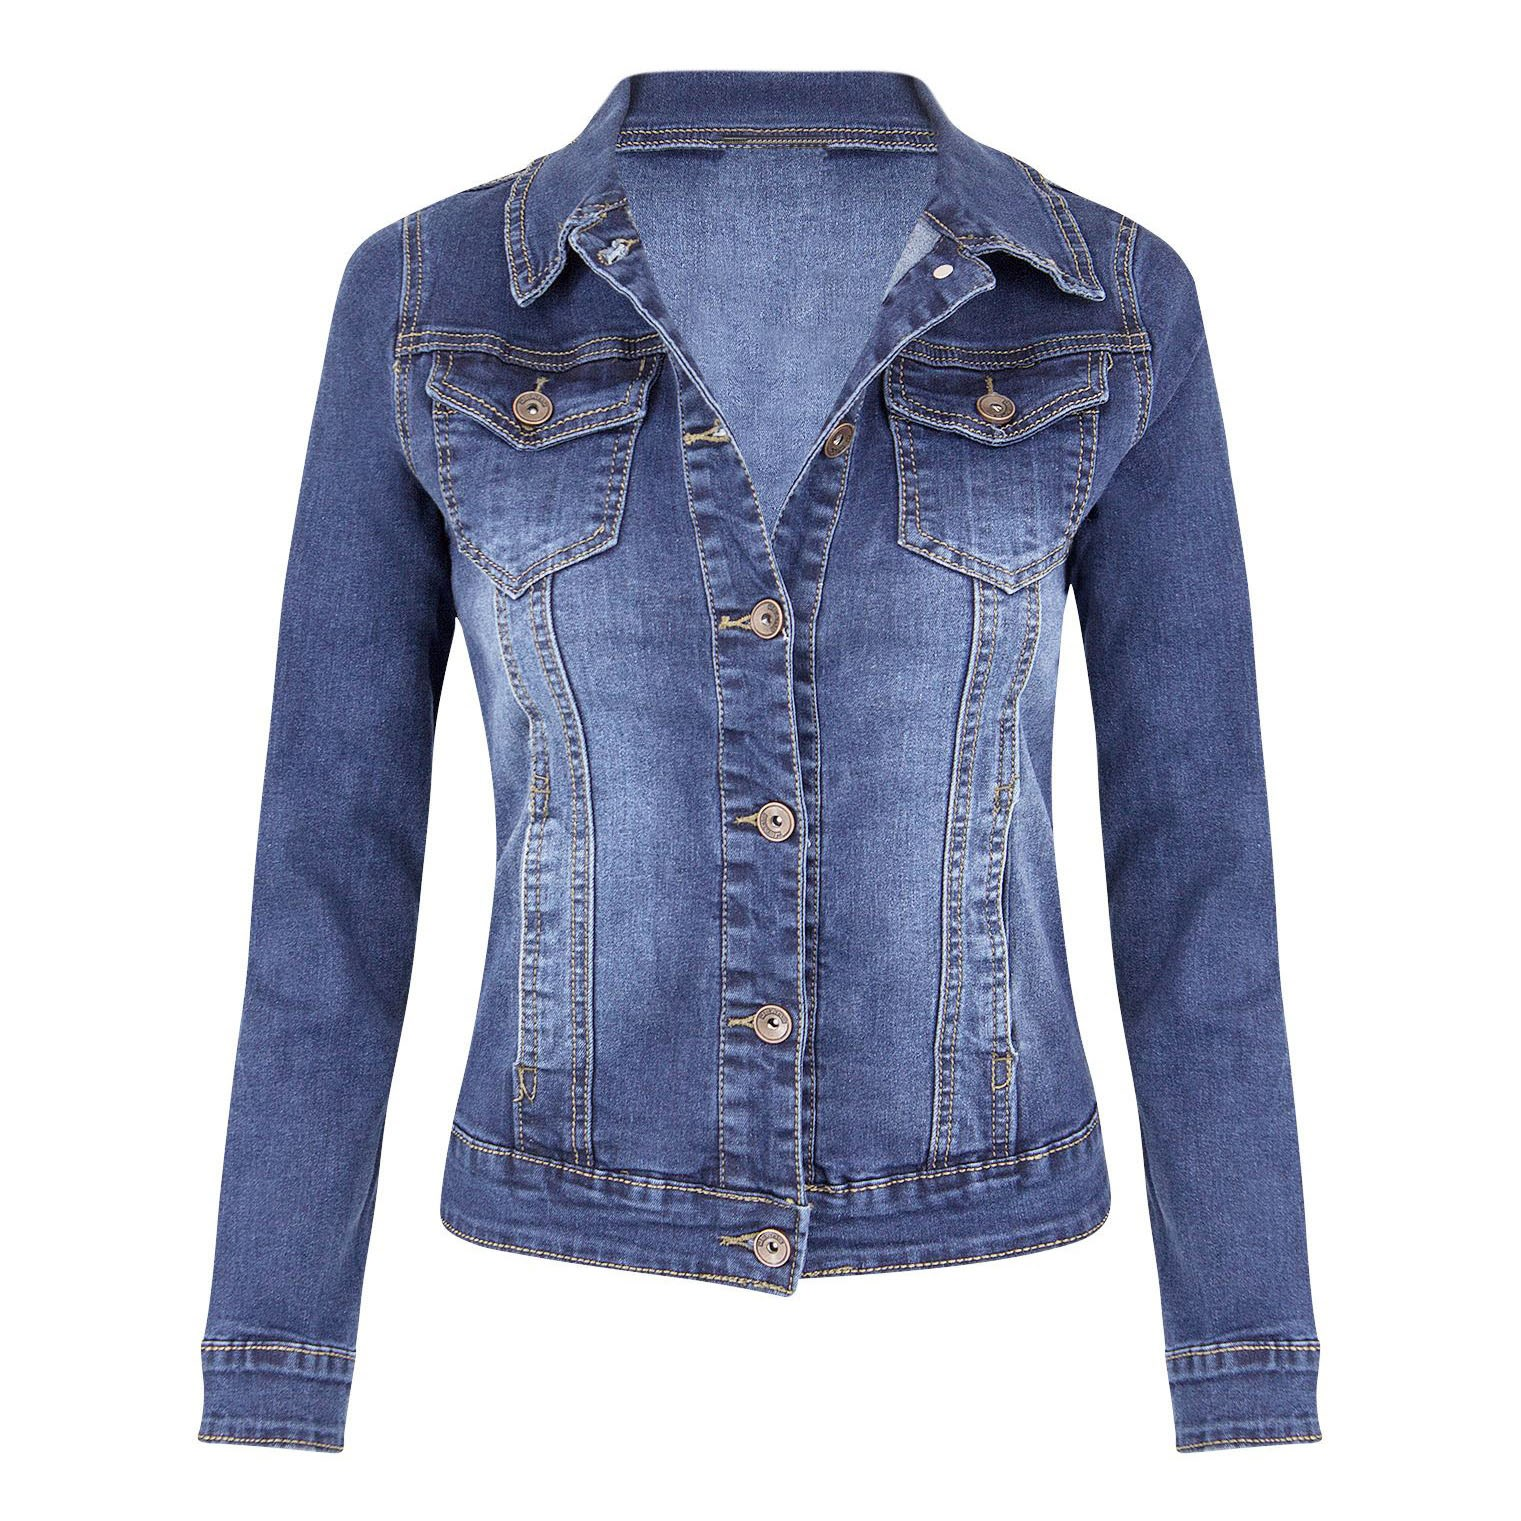 Fashion Womens Basic Jackets Women's Casual Coat Solid Women Long Sleeve Denim Jacket Coat Outcoat